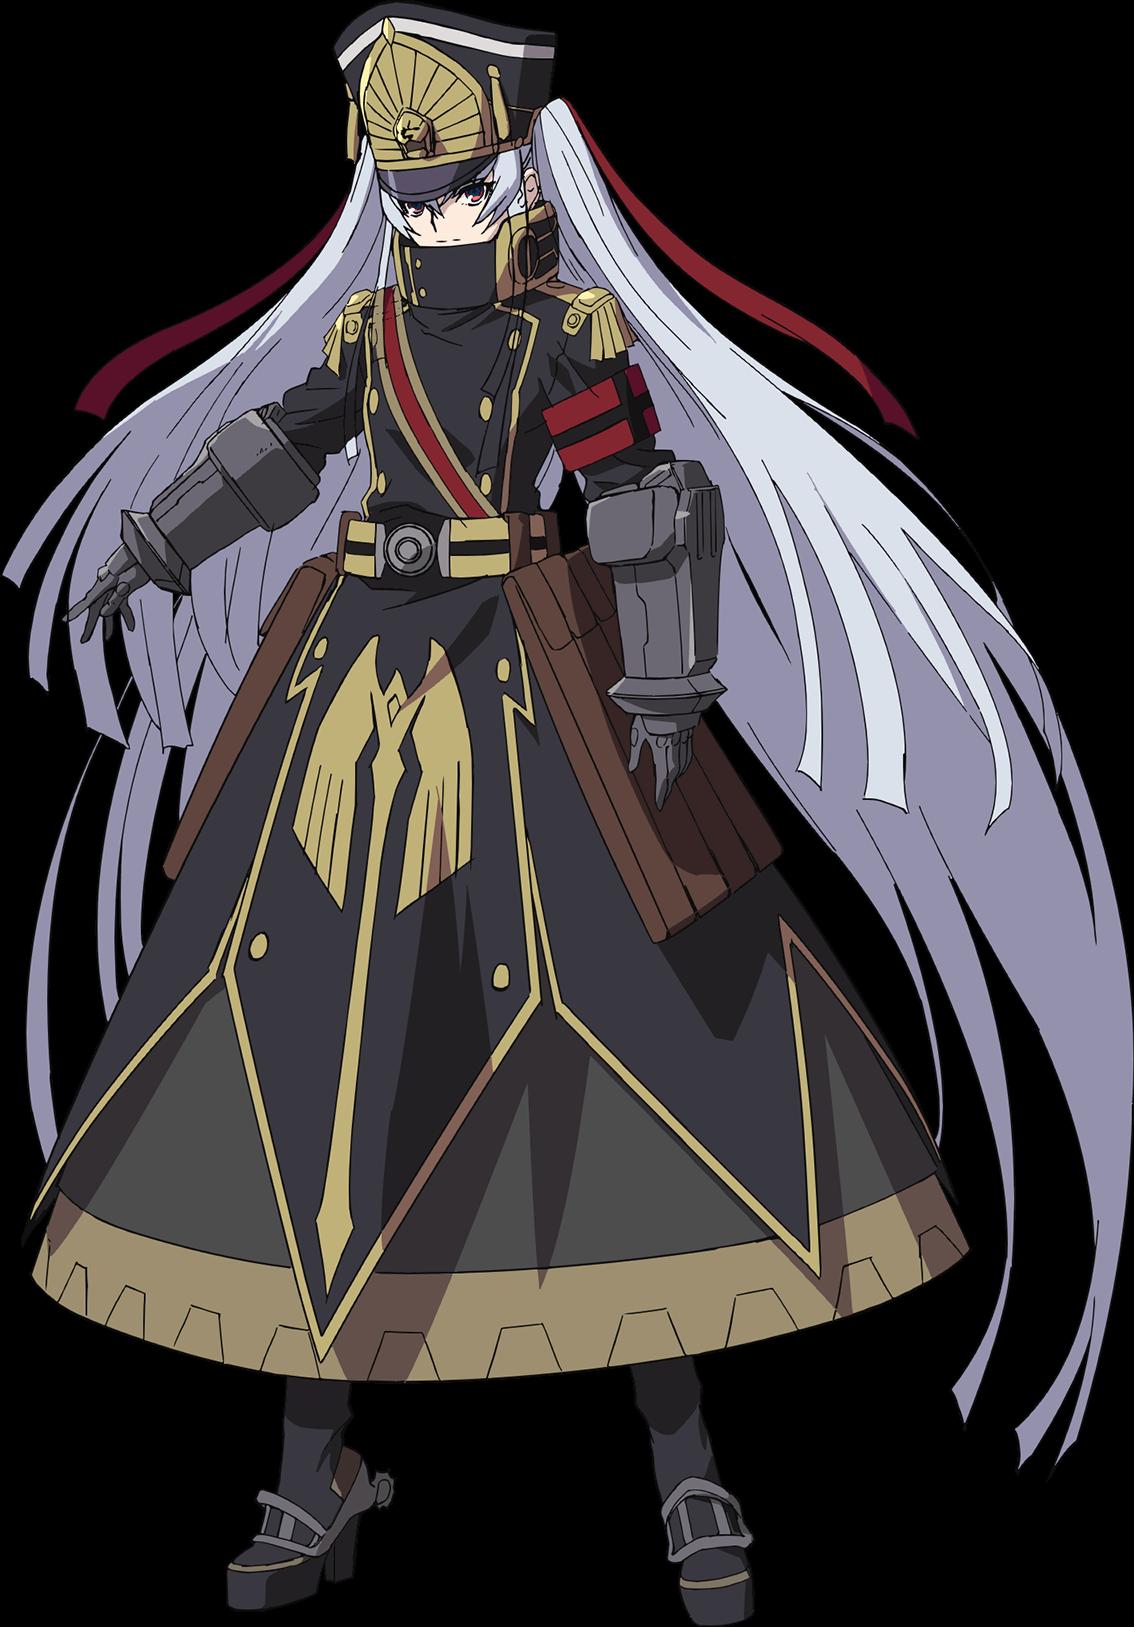 Image - Character c09 img 01.png | Recreators Wiki ...